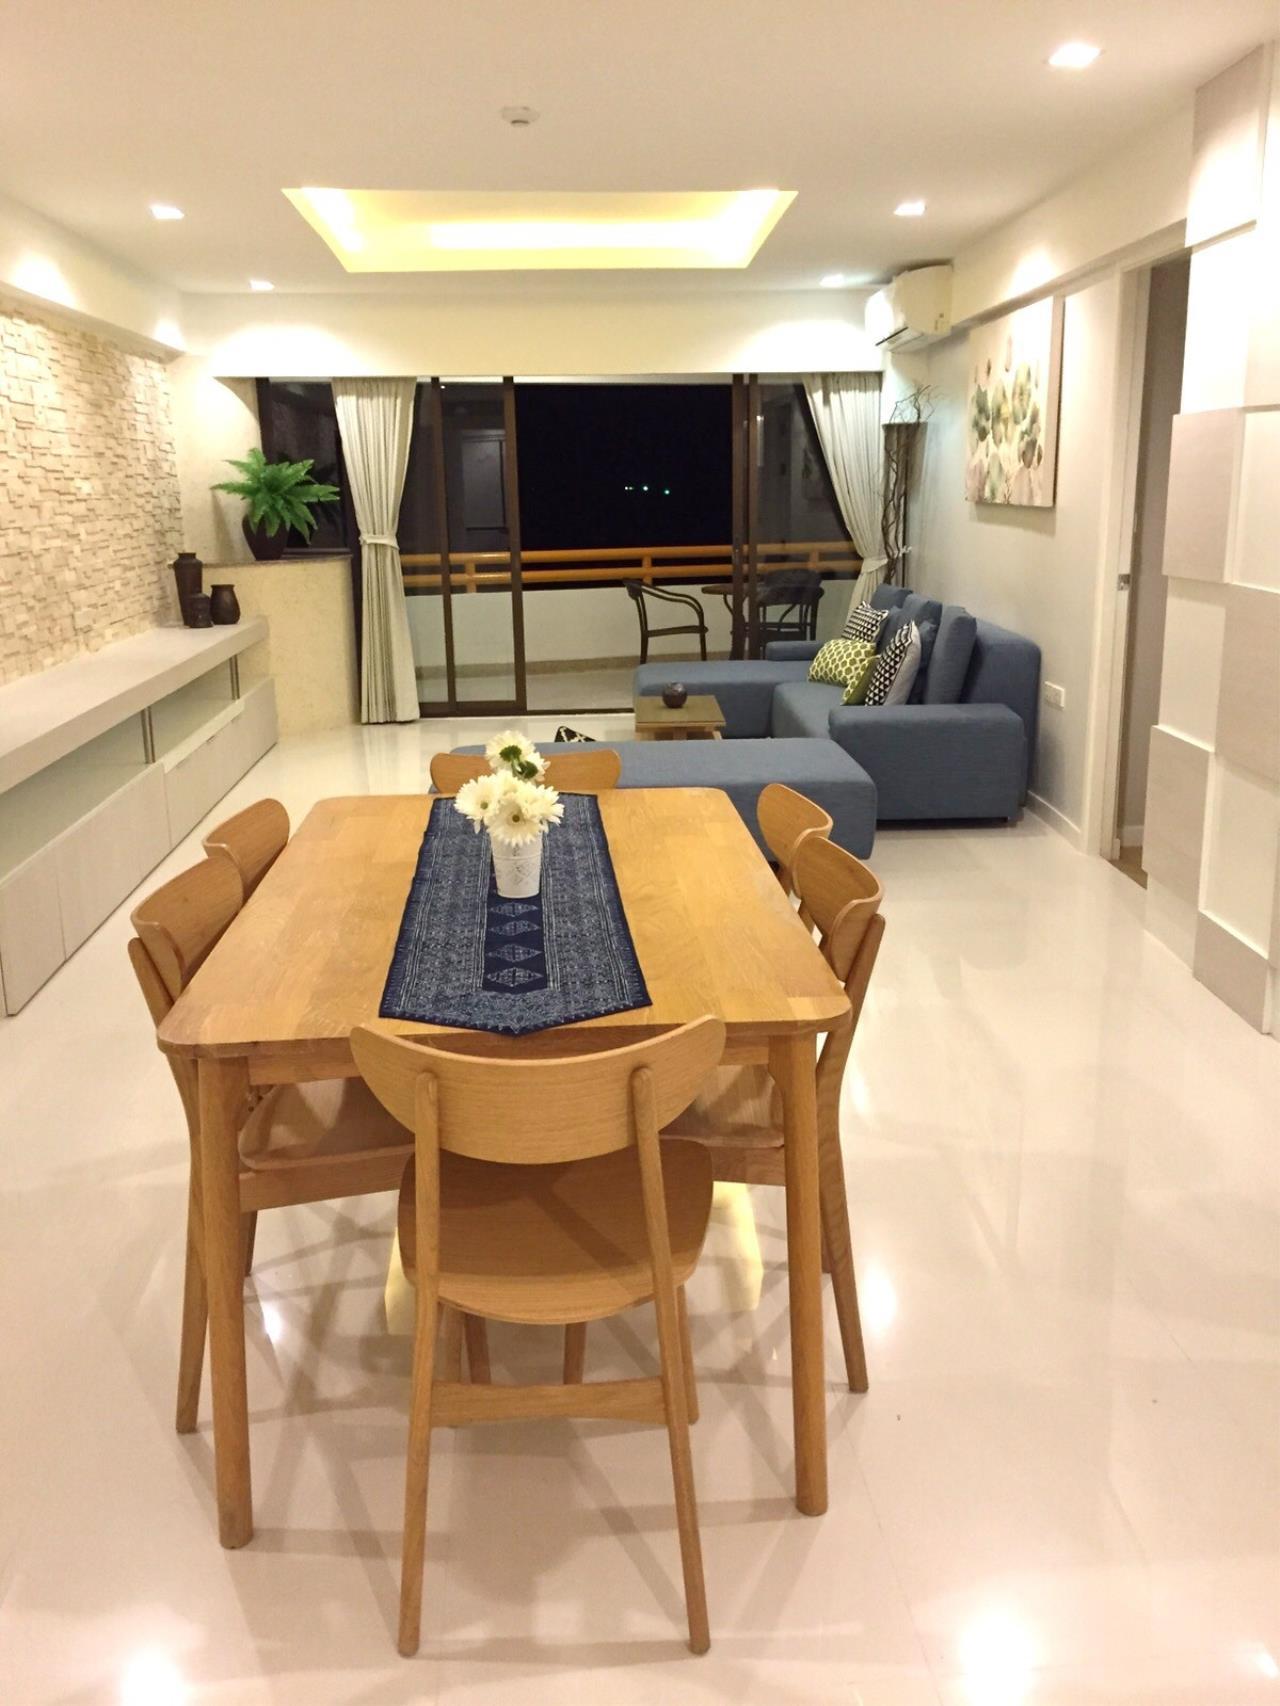 Blueocean property Agency's Condo For Rent – Sunshine Beach Condotel Pattaya 4